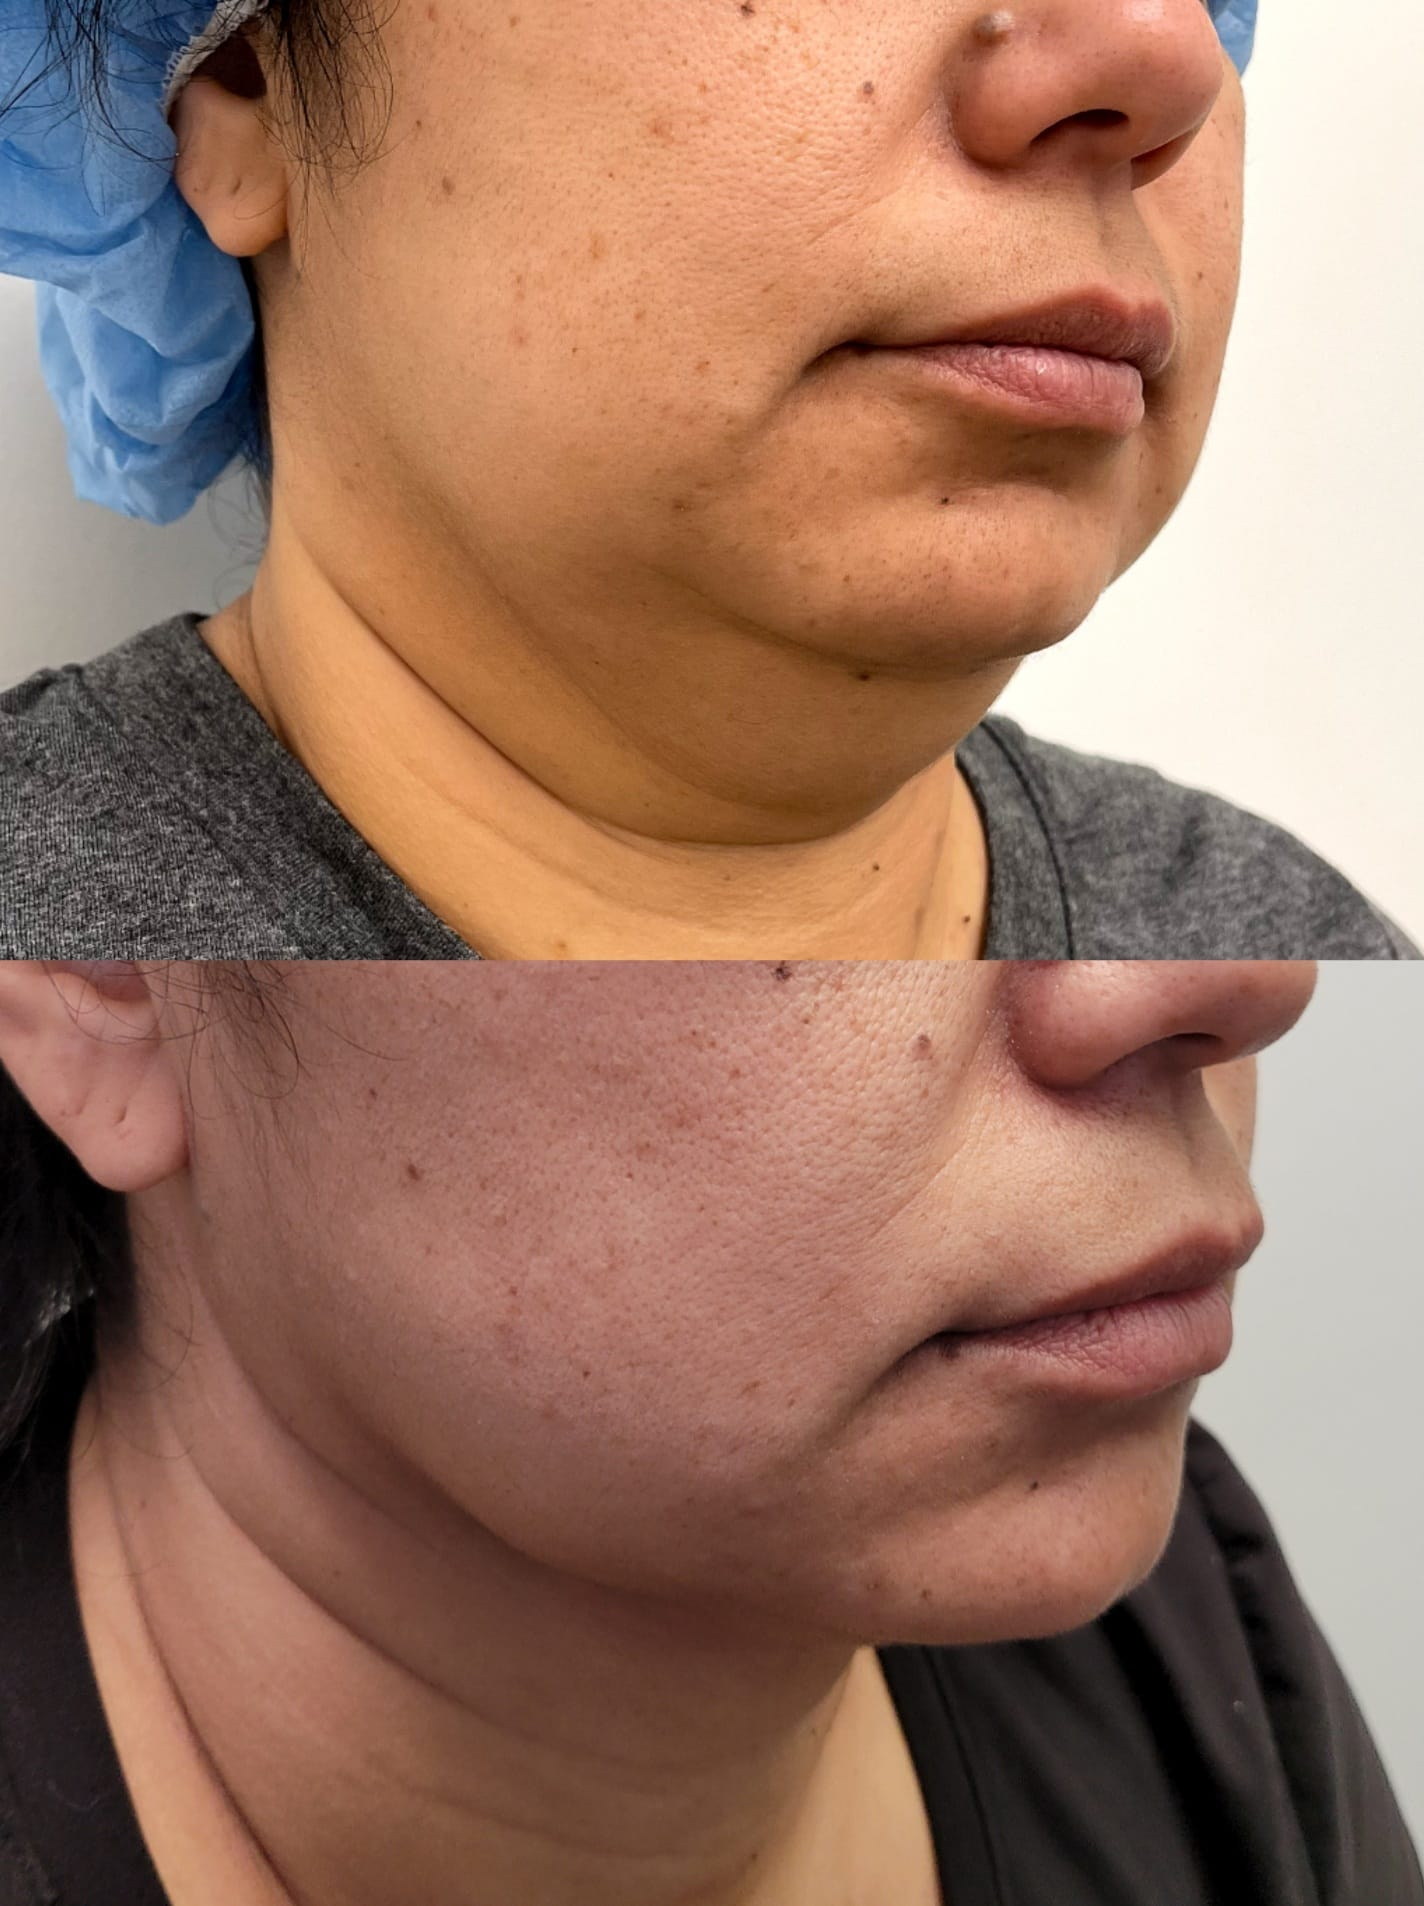 liposuction top treatment surgery in Oxnard